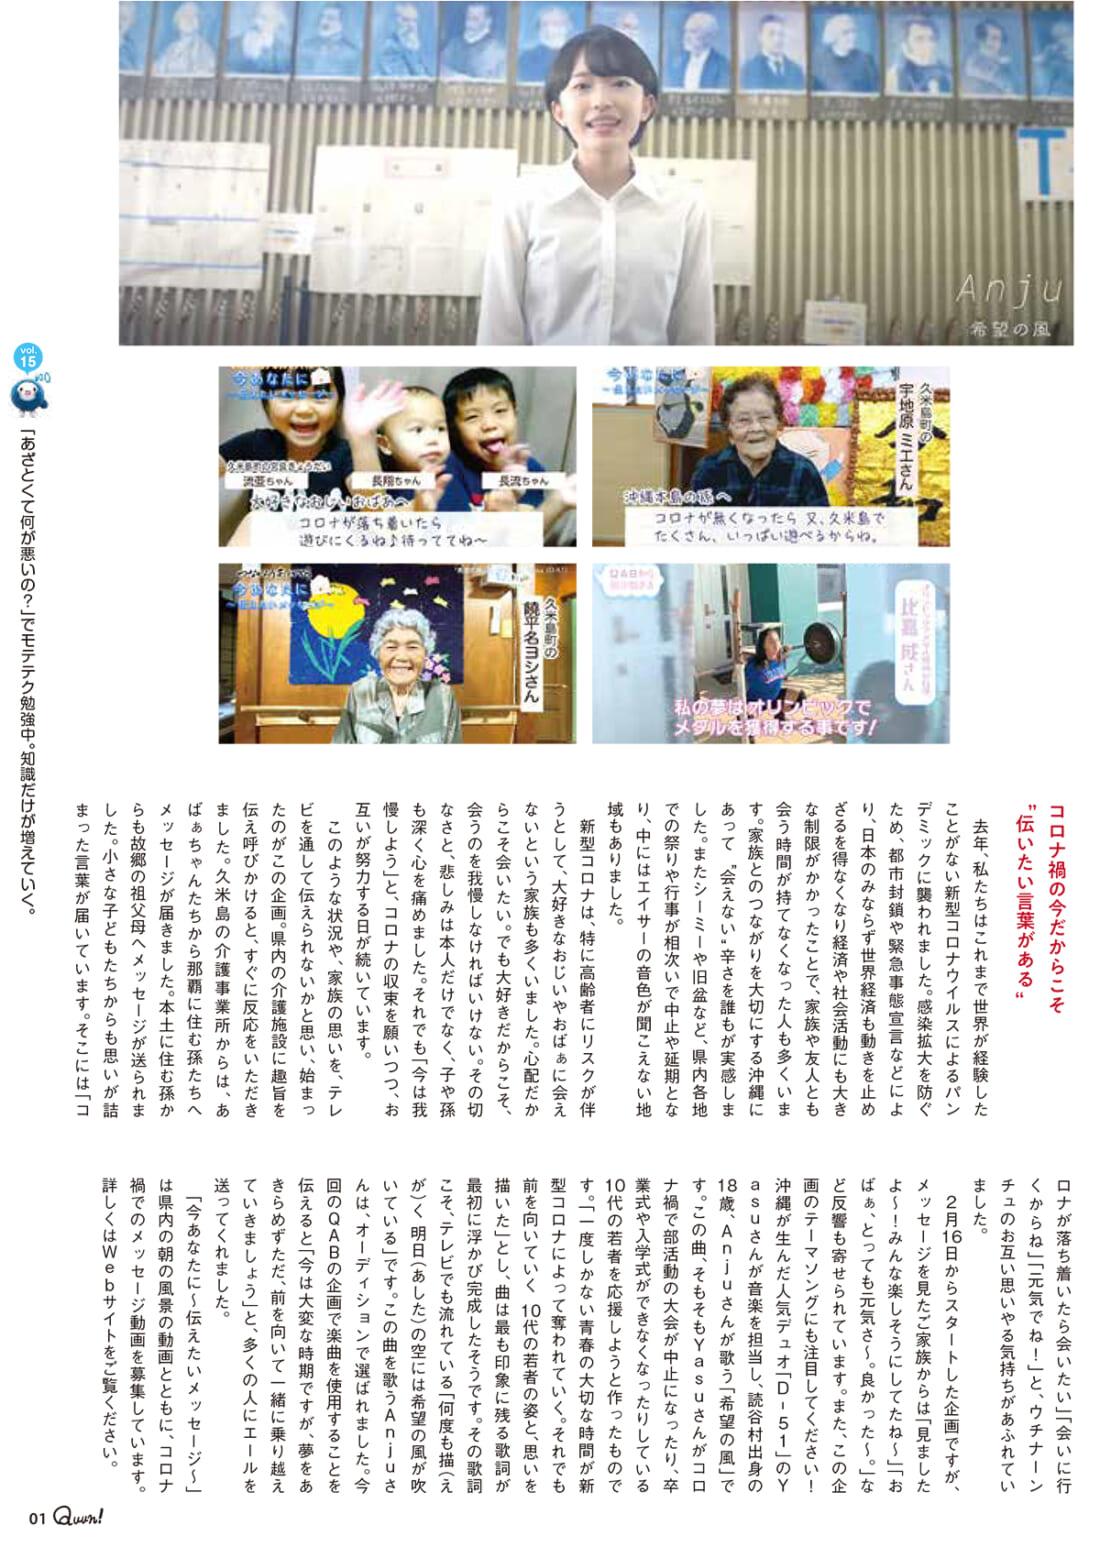 https://www.qab.co.jp/qgoro/wp-content/uploads/quun_1503-1100x1558.jpg